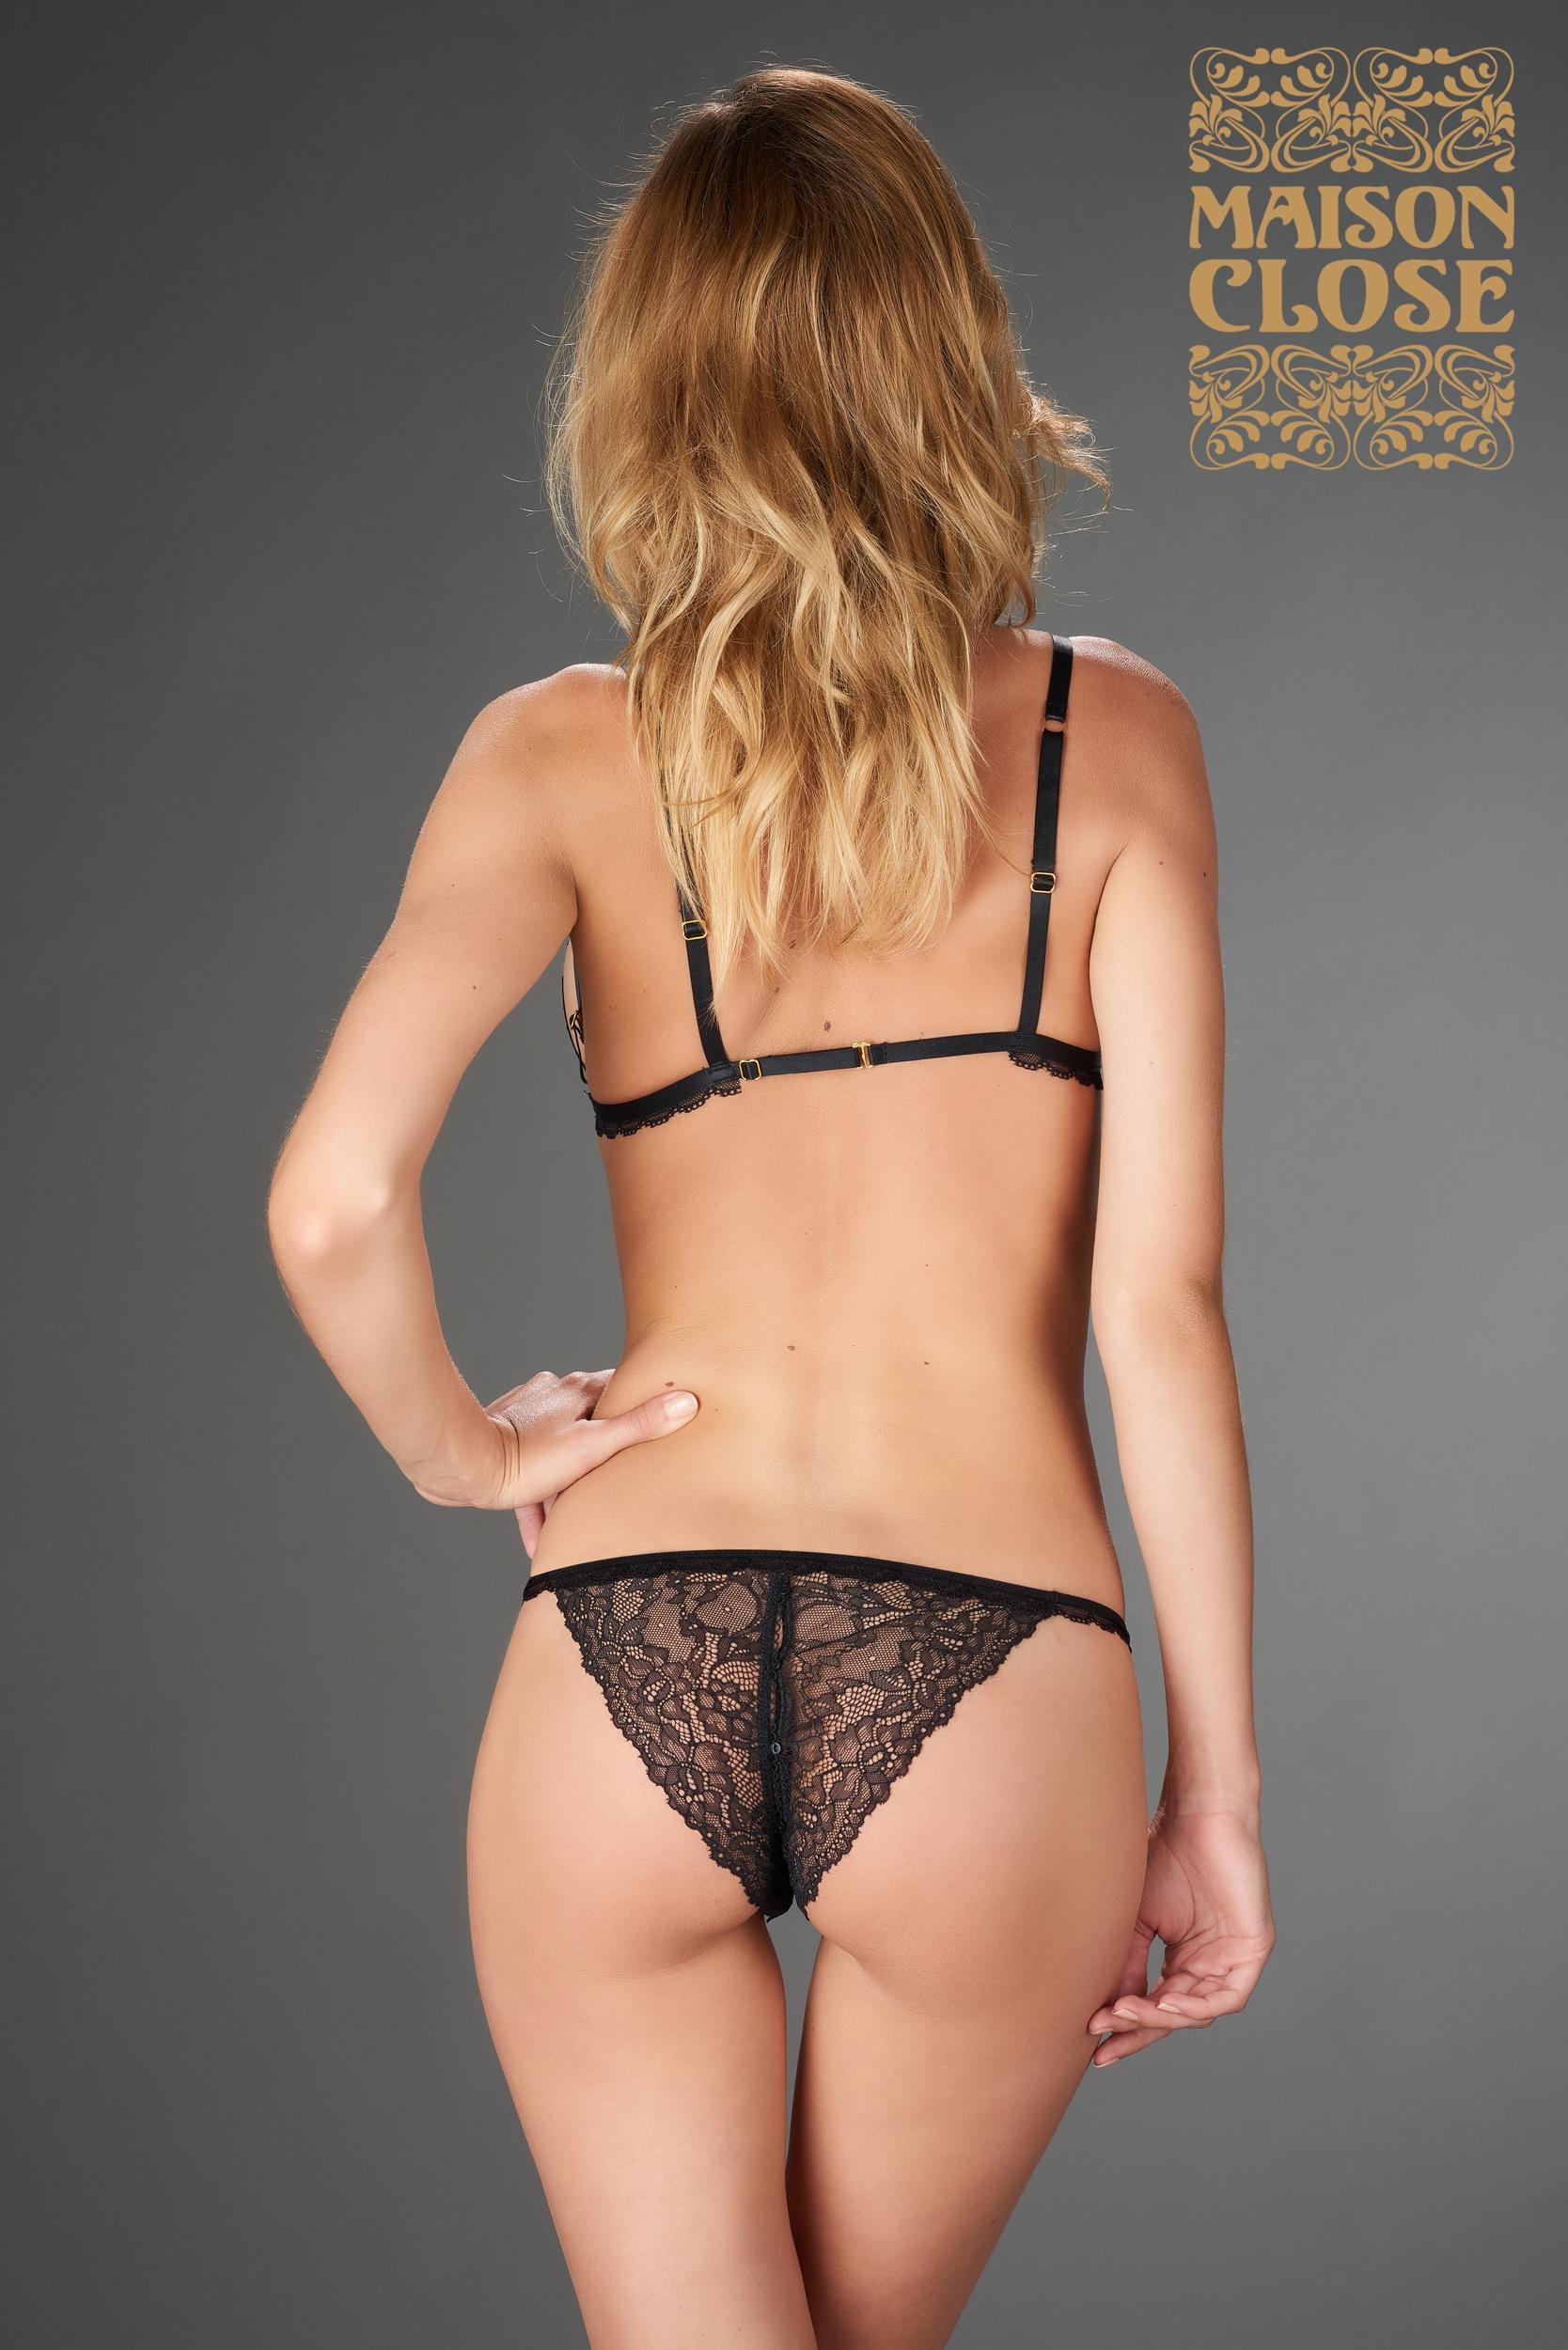 LE PETIT SECRET - OPENABLE TANGA - BLACK | Brands, Maison Close, LINGERIE & KLÄDER, SEXIGA UNDERKLÄDER, Sexiga Trosor | Intimast.se - Sexleksaker